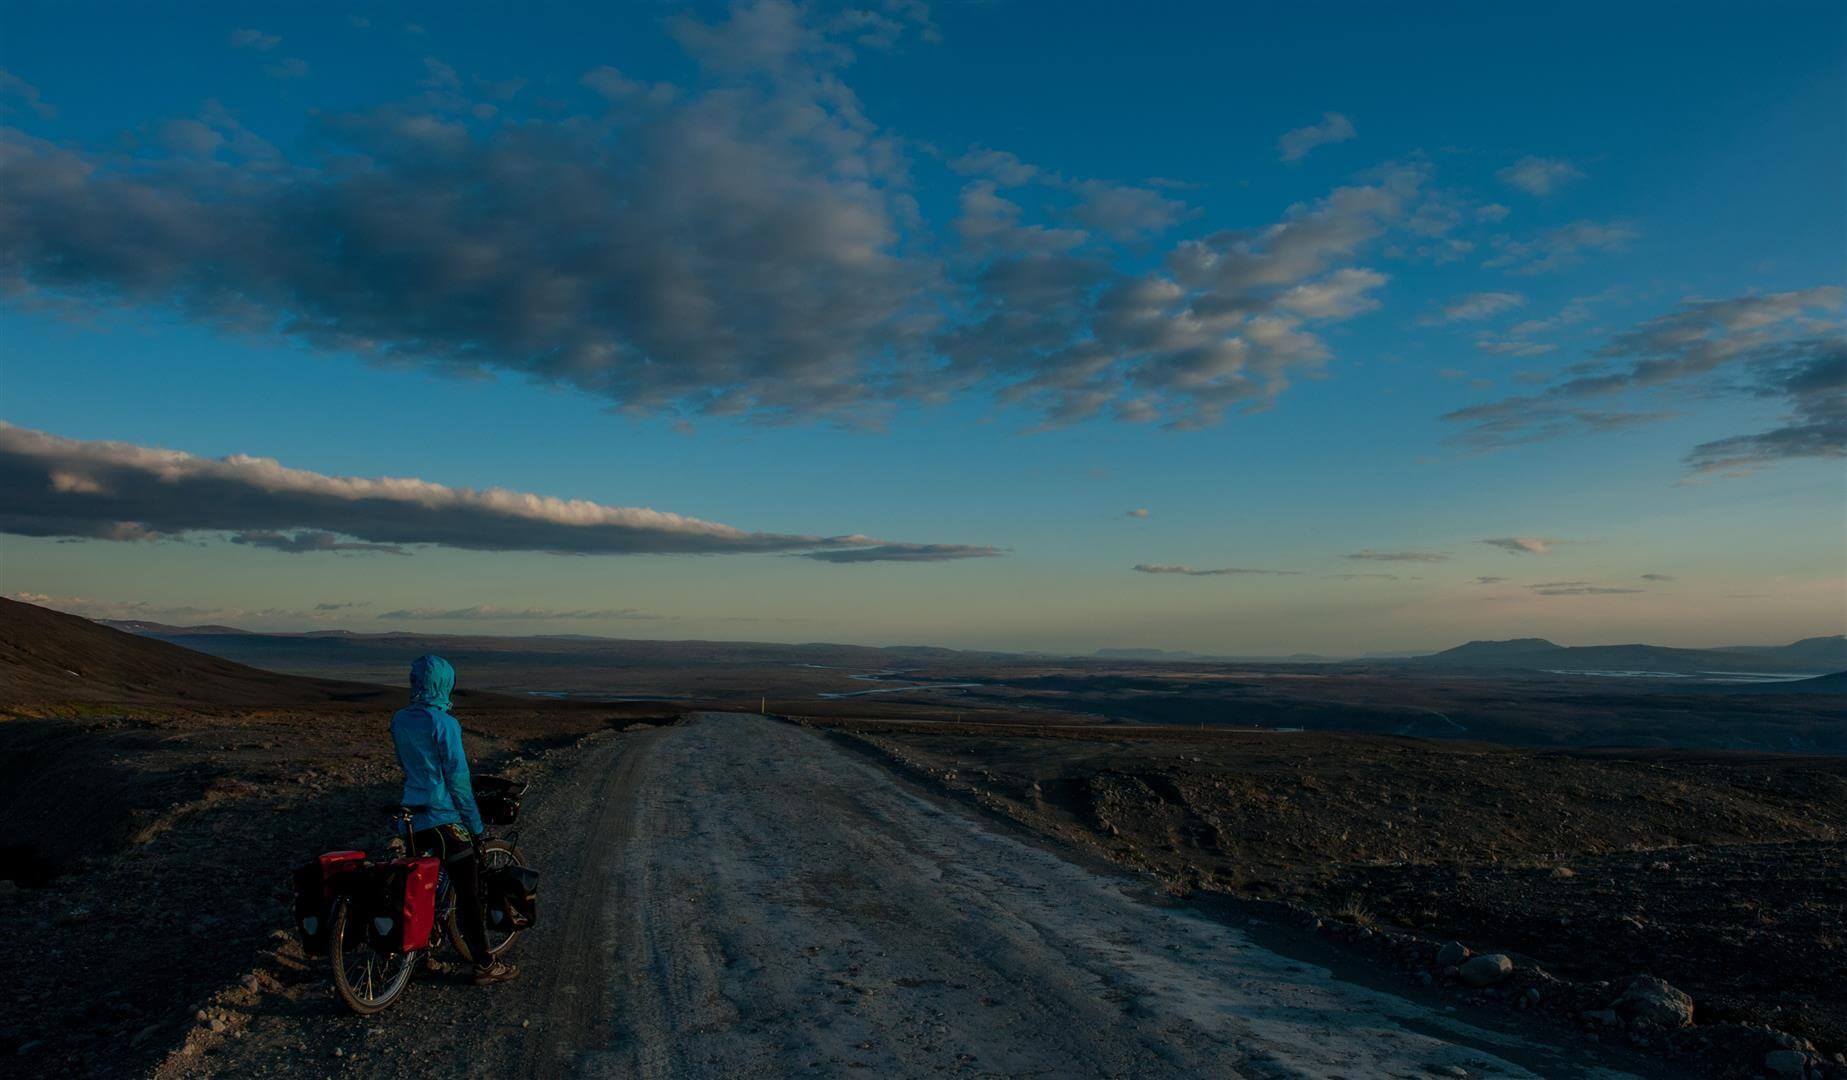 islandia-kjolur-robi-sie-ciemno